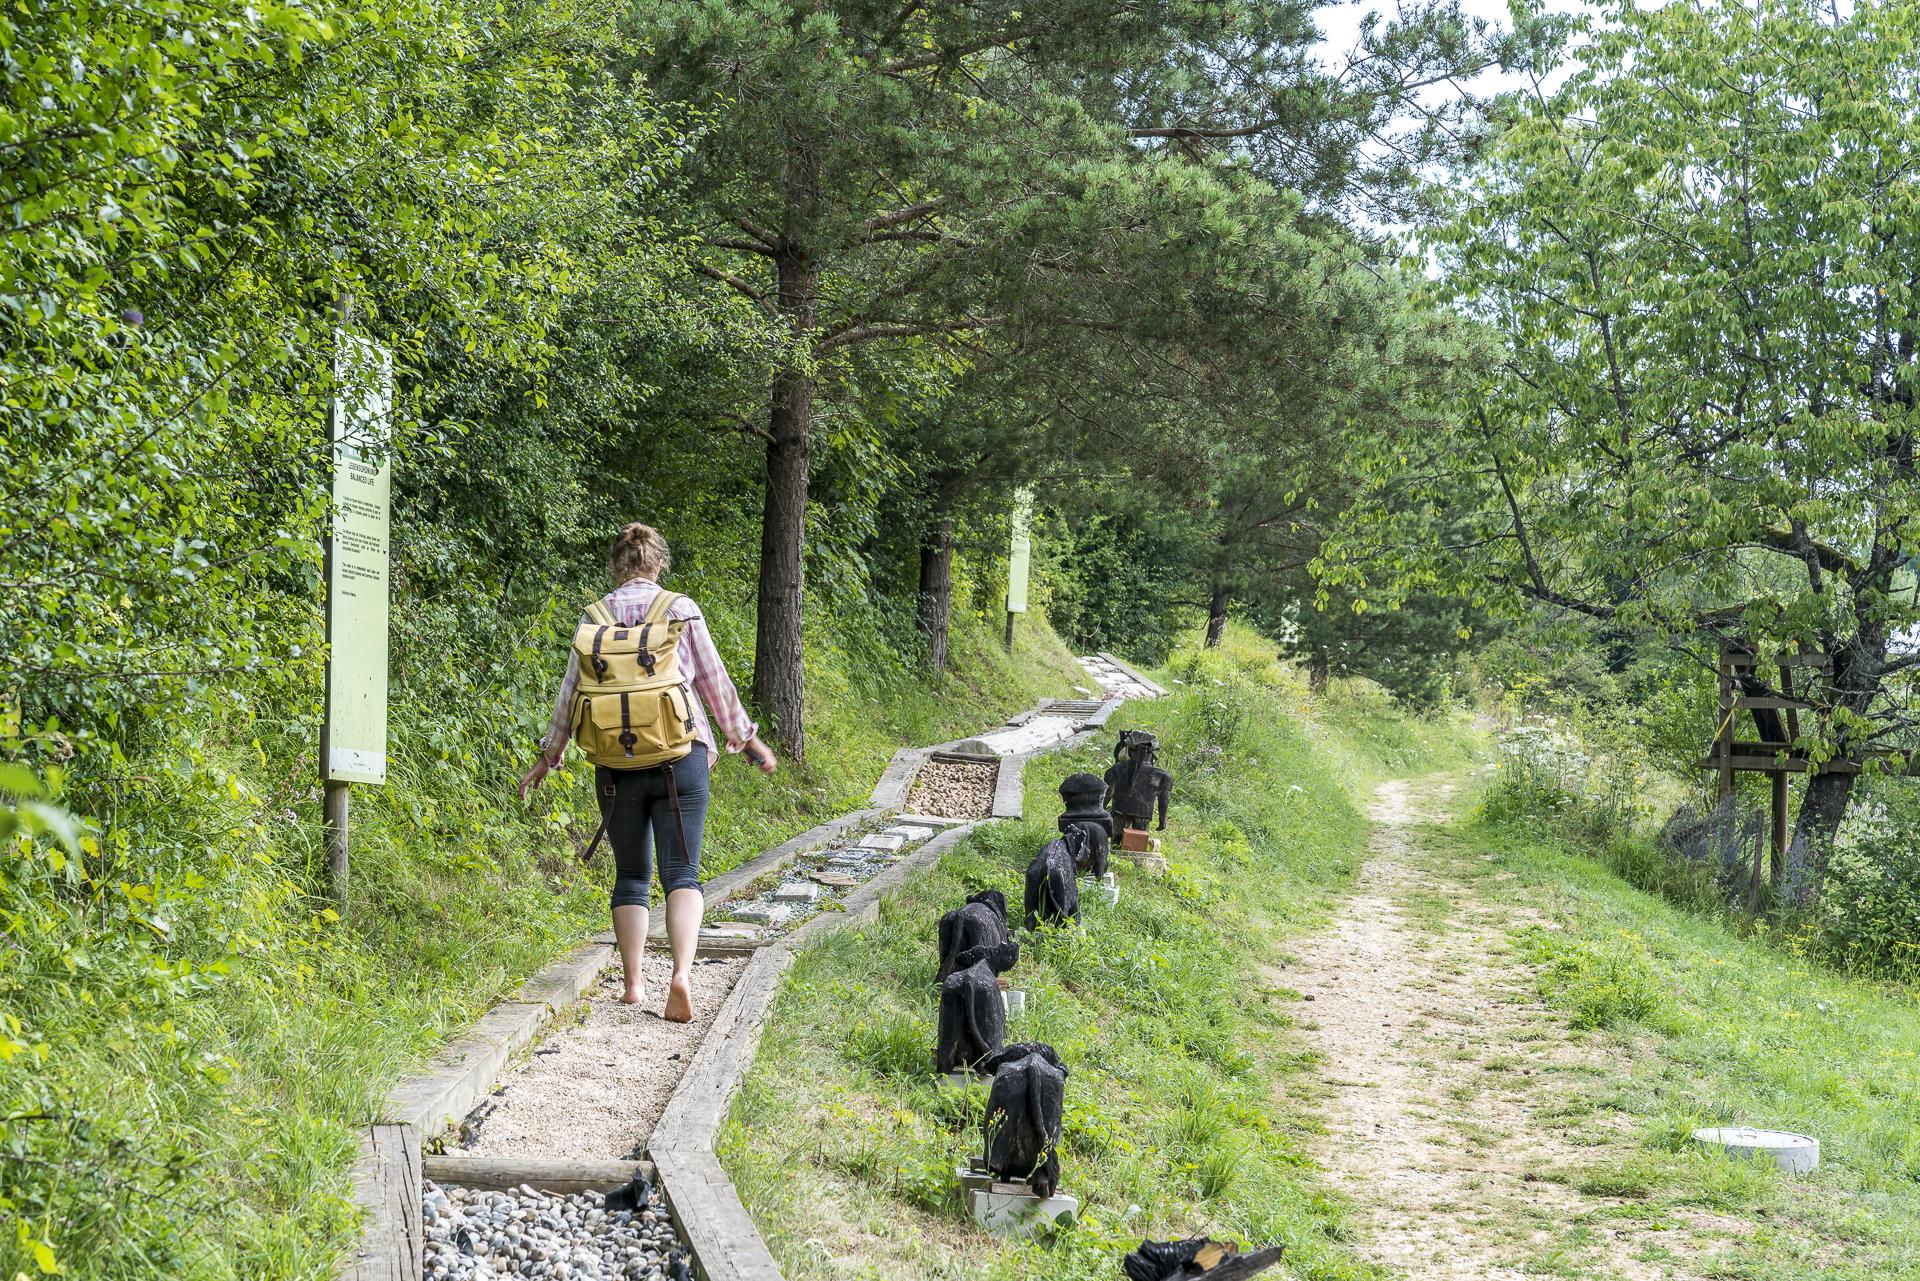 Anlage Sentier Pieds Nus Jura